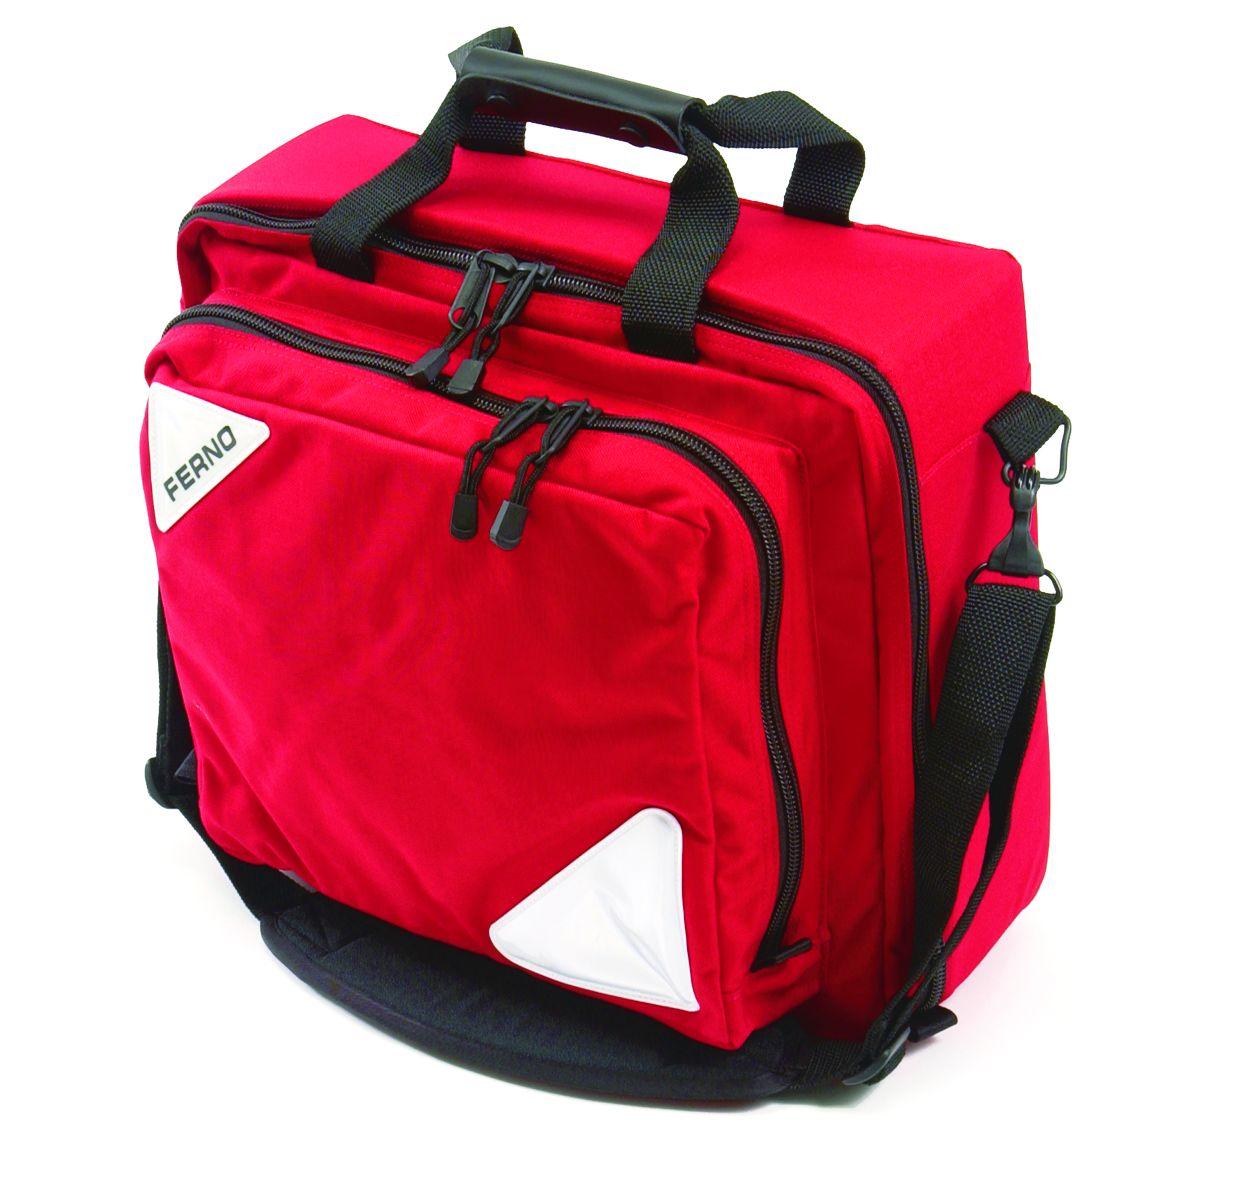 Model 5103 Trauma Responder Ii Bag Ferno Canada